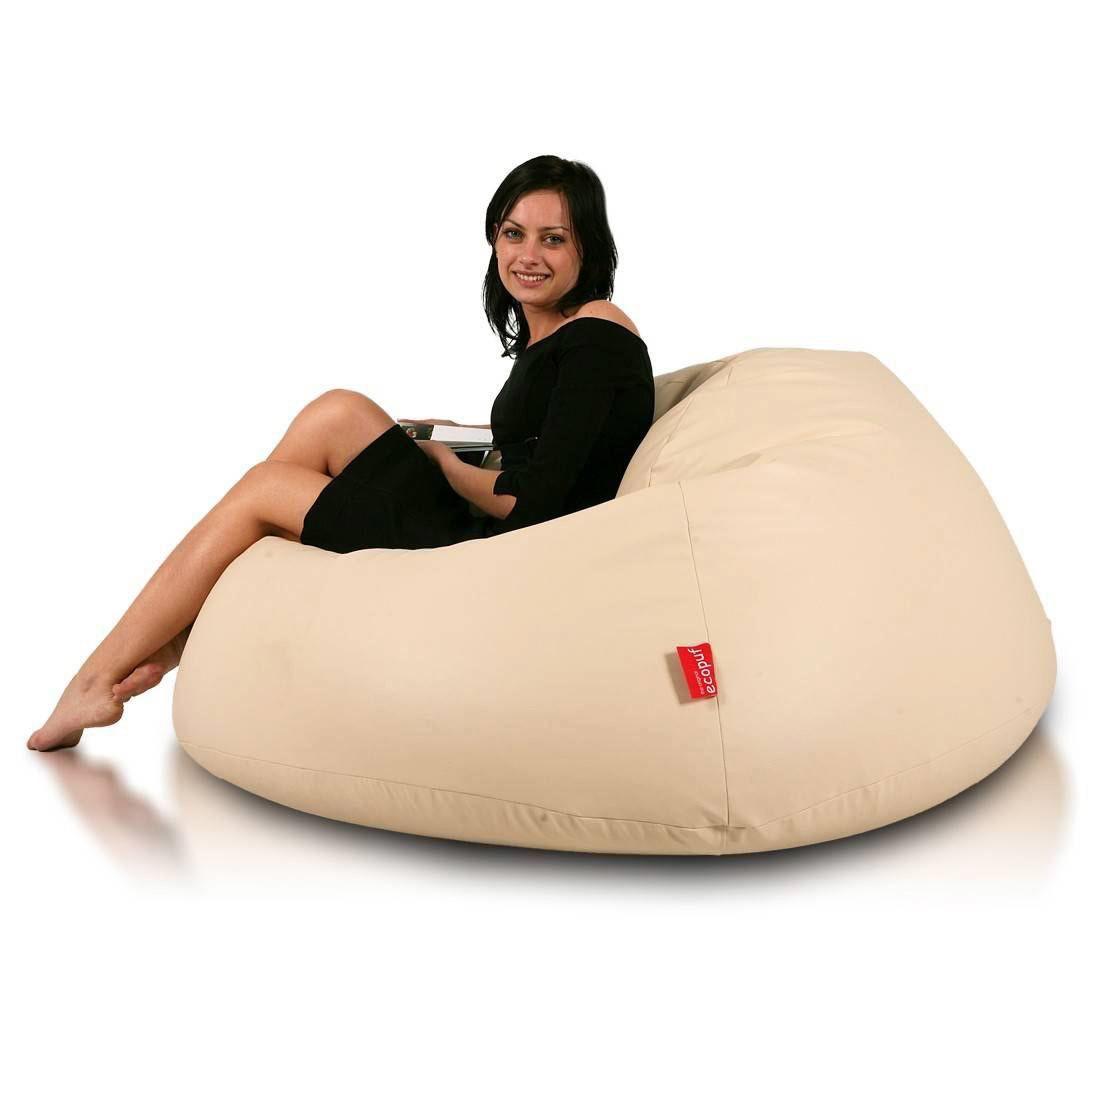 Large Faux Leather Bean Bag Chair Lounger Bean Bag Chair Large Bean Bag Chairs Leather Bean Bag